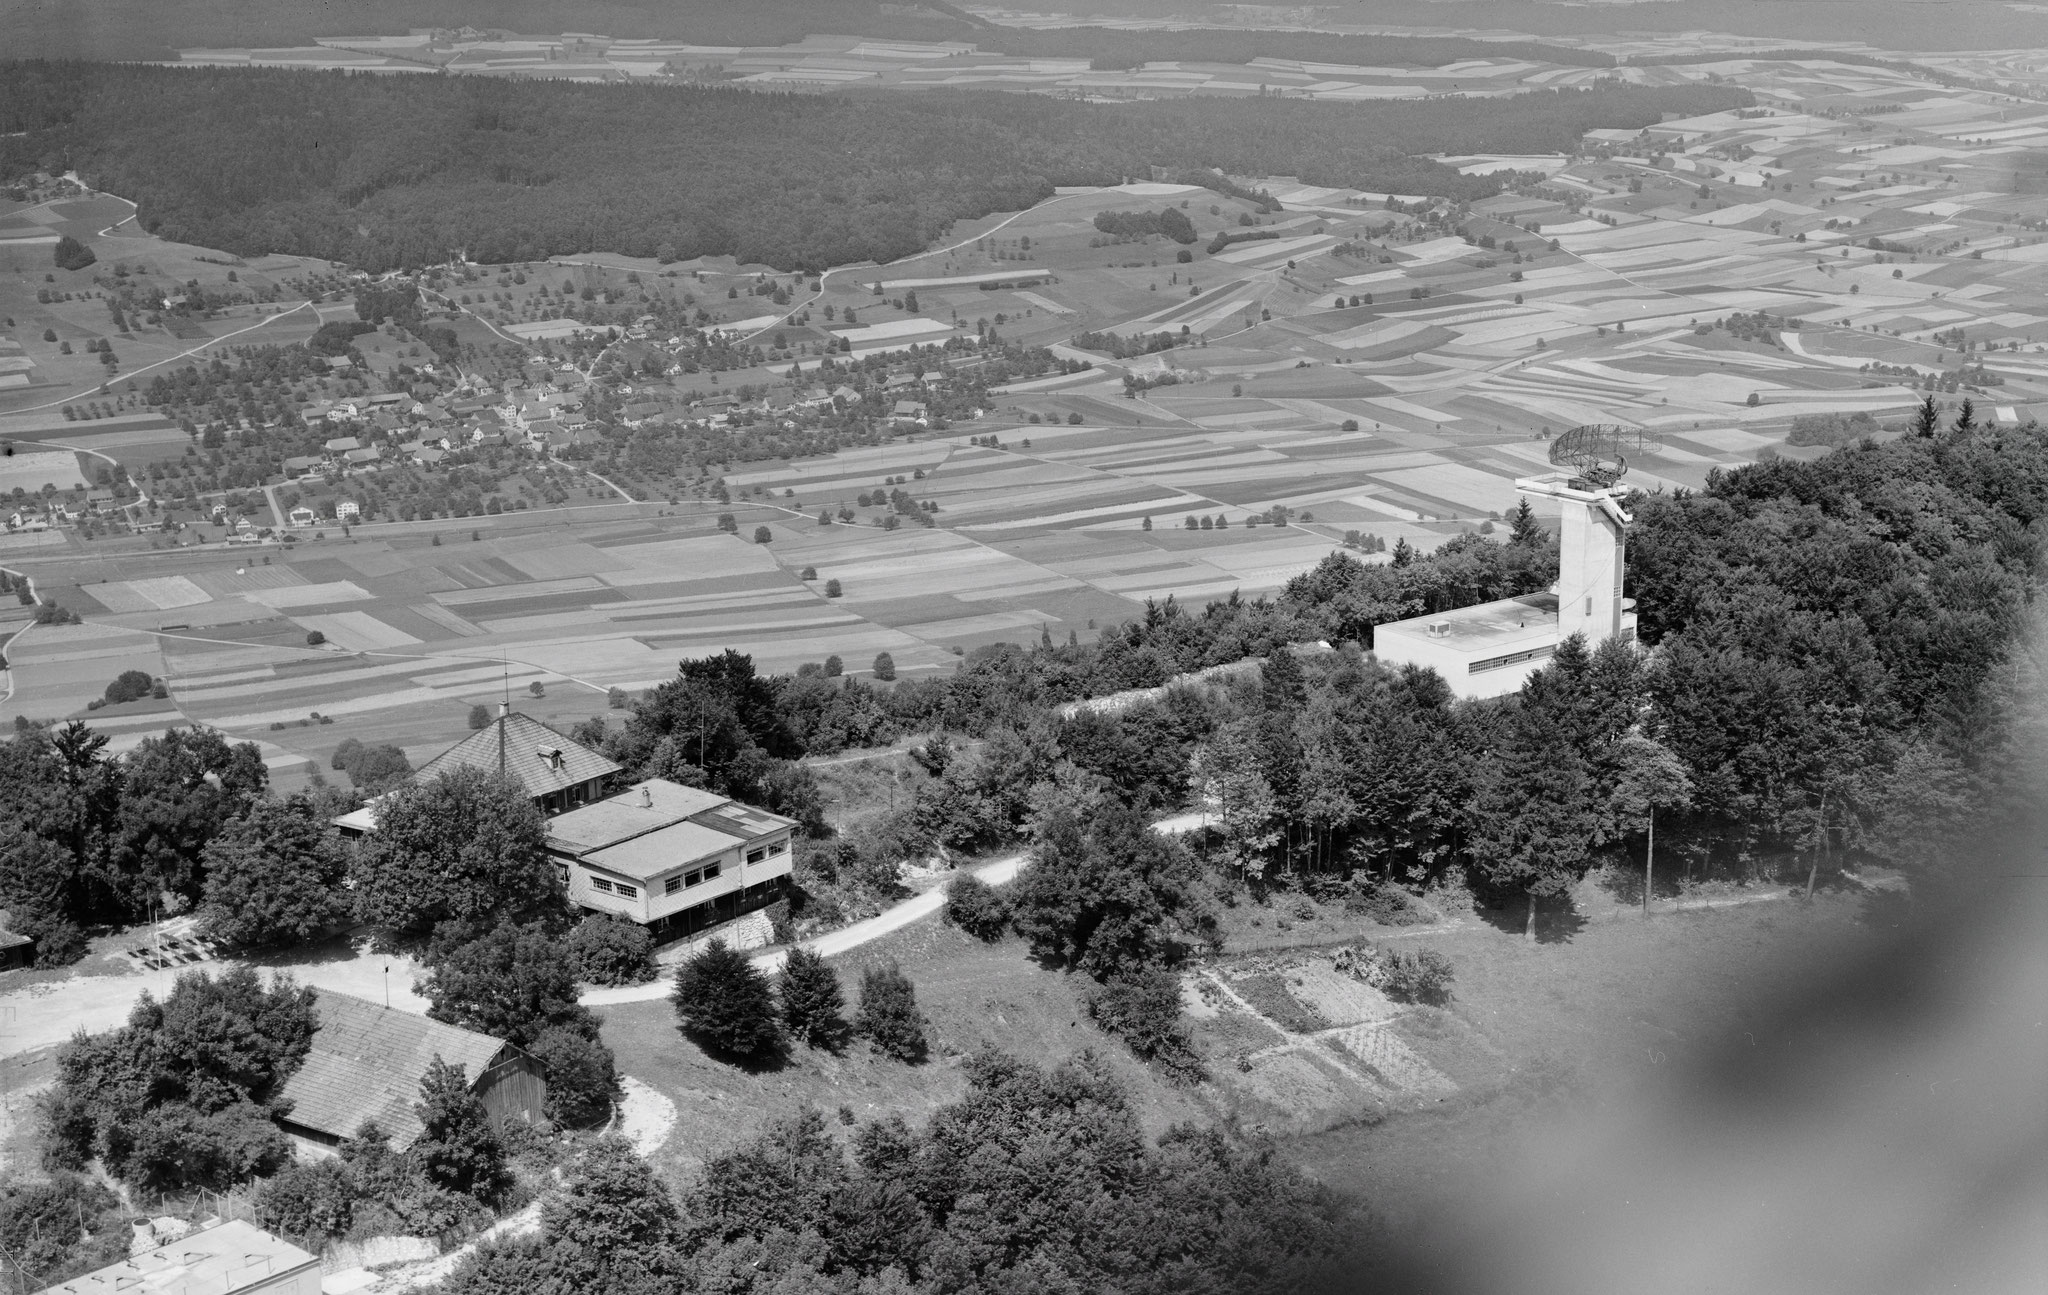 1964::ETH-Bibliothek Zürich, Bildarchiv / Fotograf: Comet Photo AG (Zürich) / Com_F64-03601 / CC BY-SA 4.0